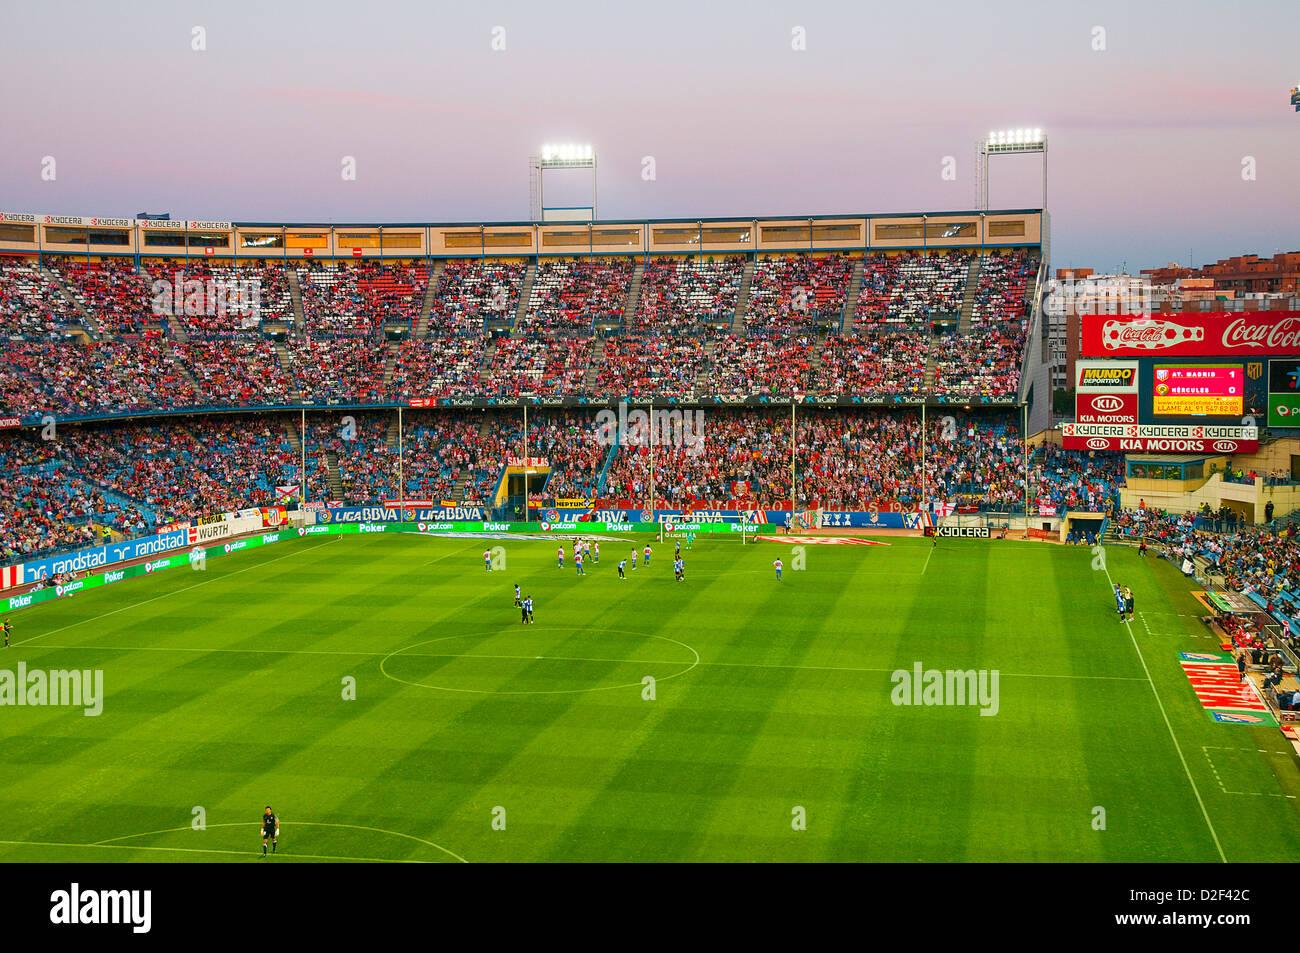 Football match in Vicente Calderon stadium. Madrid, Spain. - Stock Image